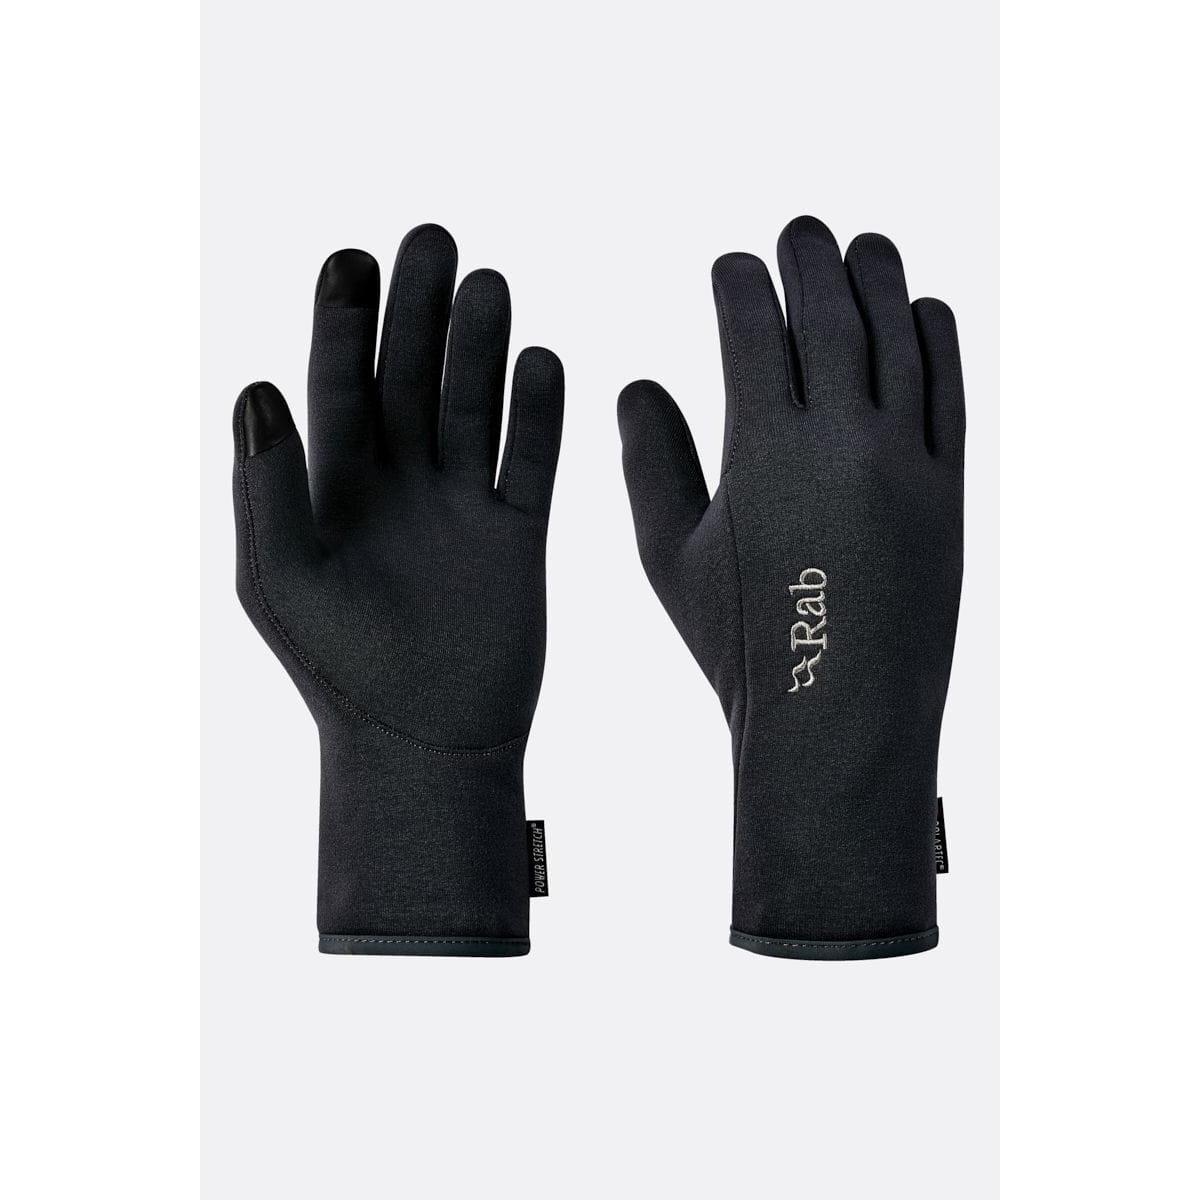 Rab Power Stretch Contact Glove - Black